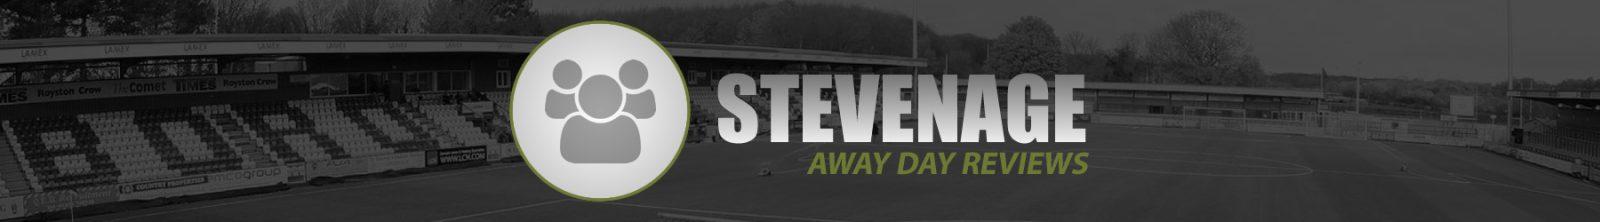 Review Stevenage